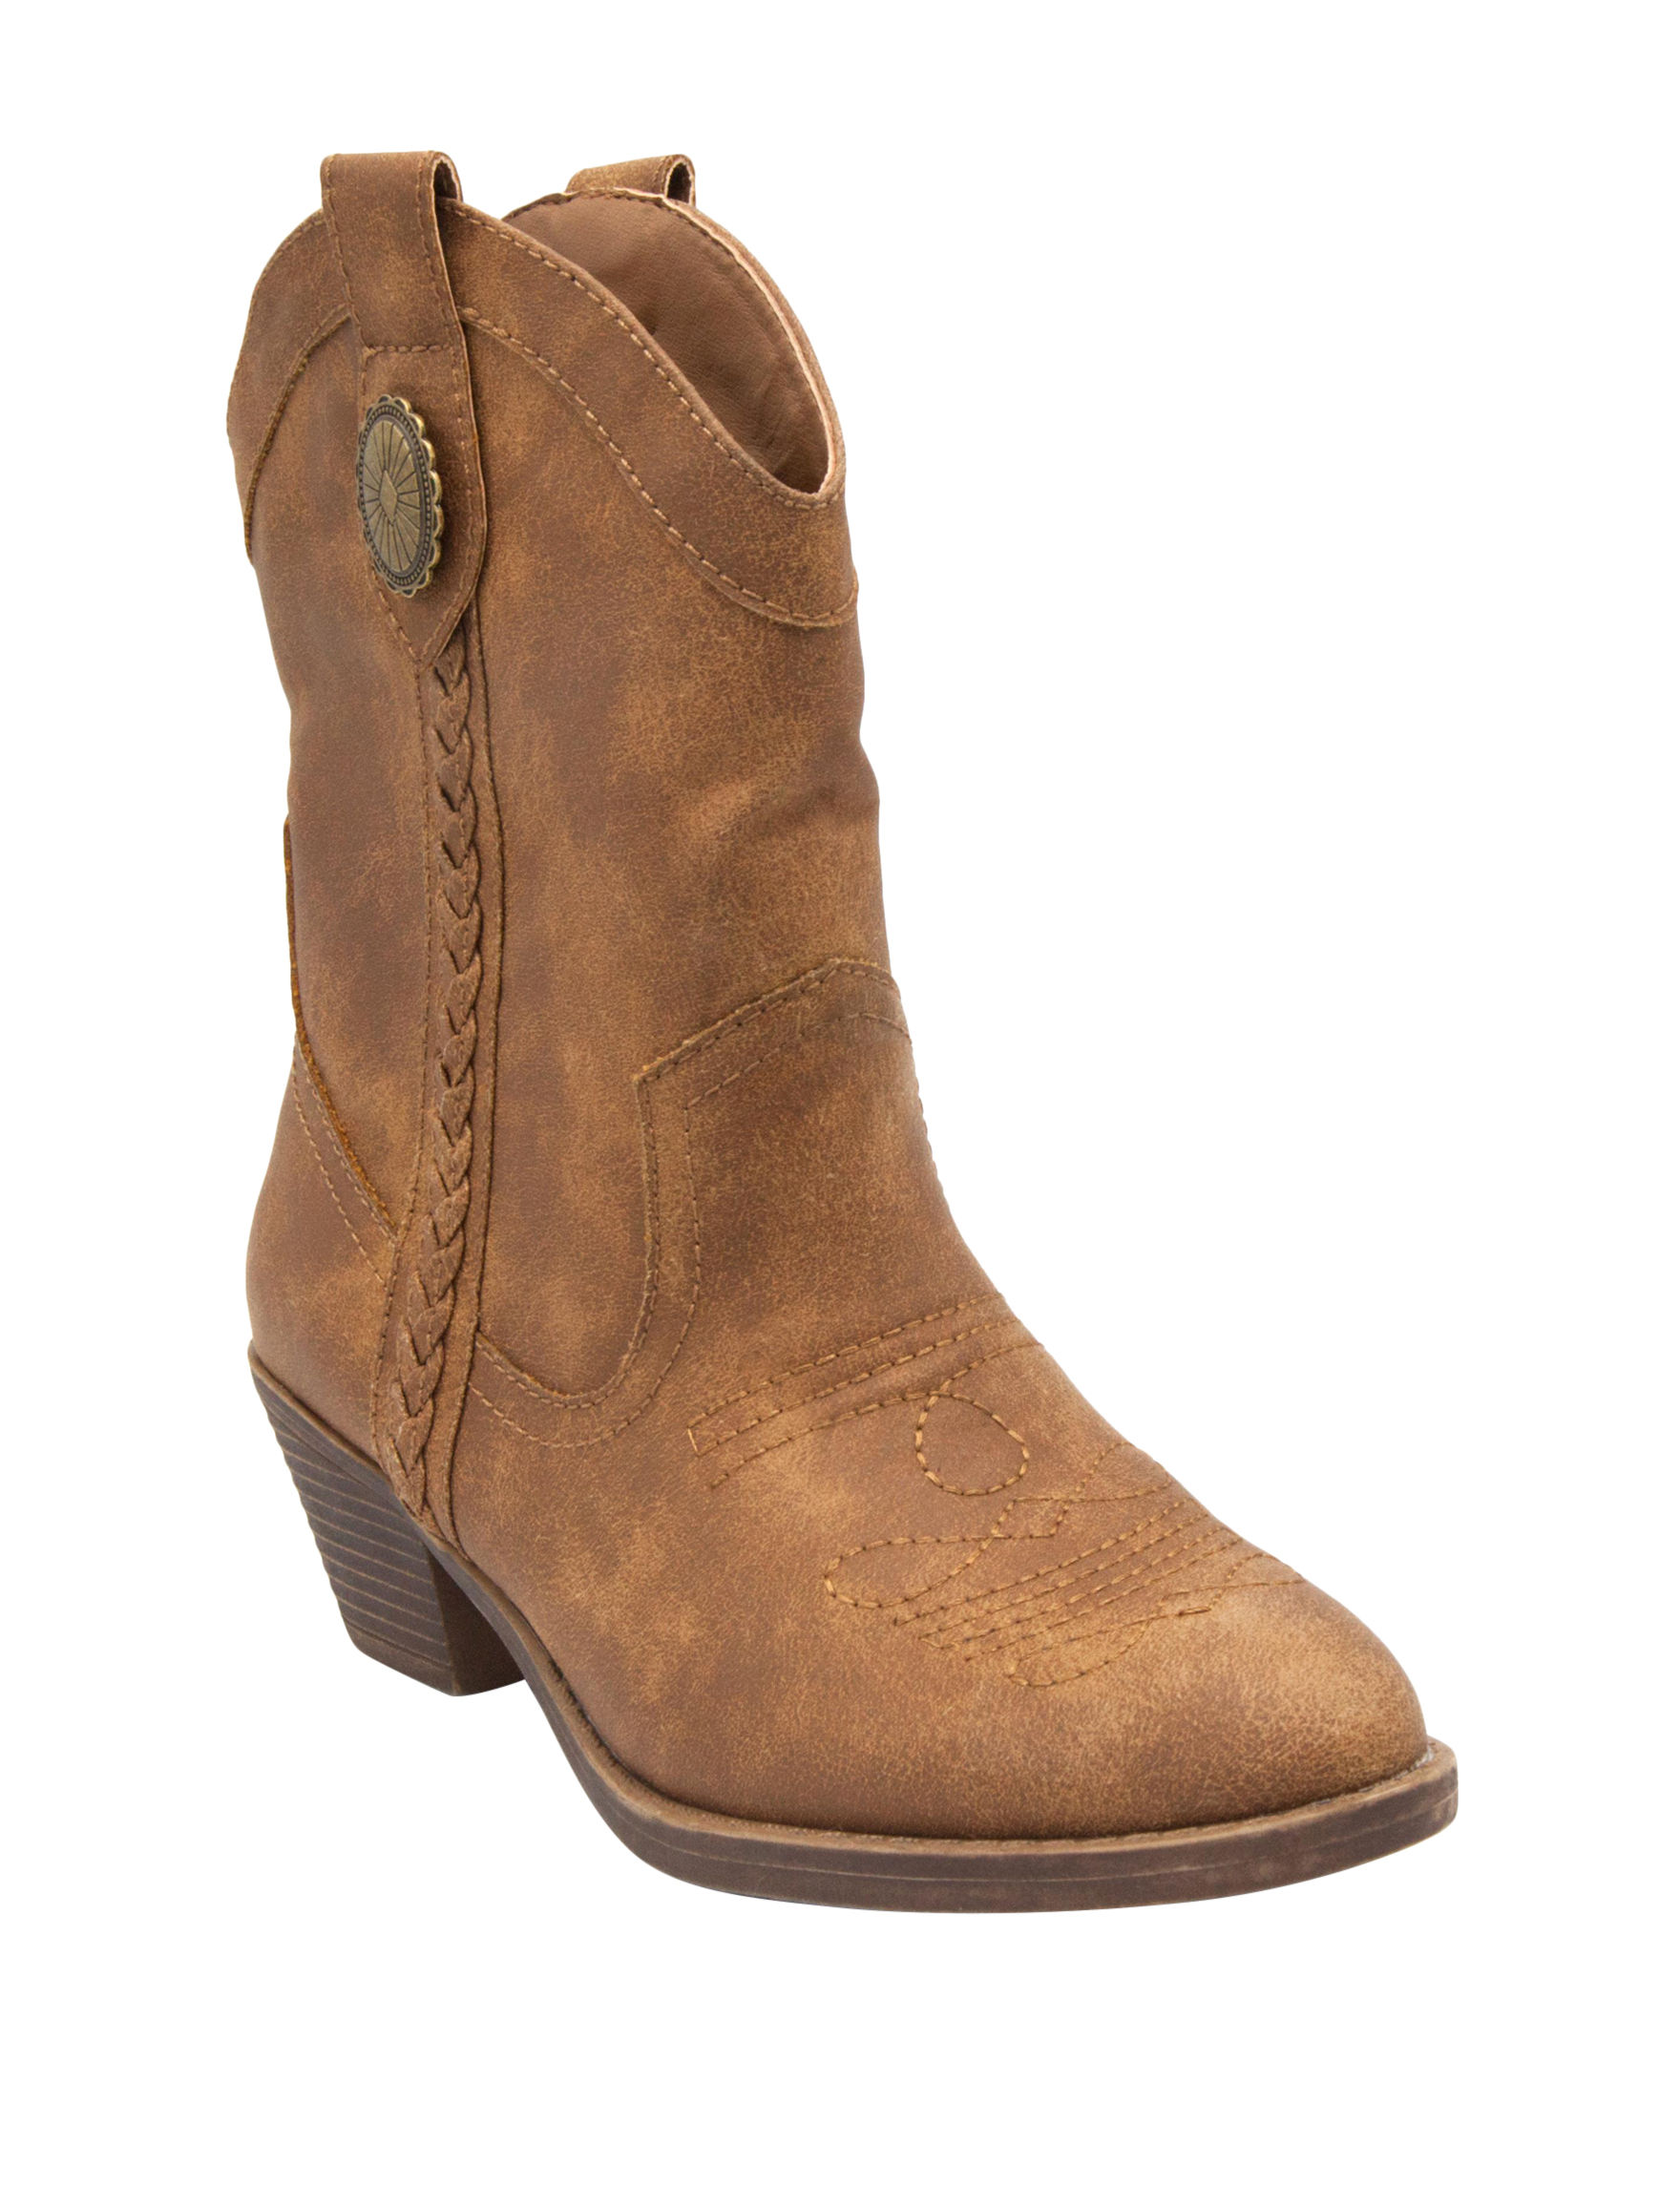 Rampage Brown Western & Cowboy Boots